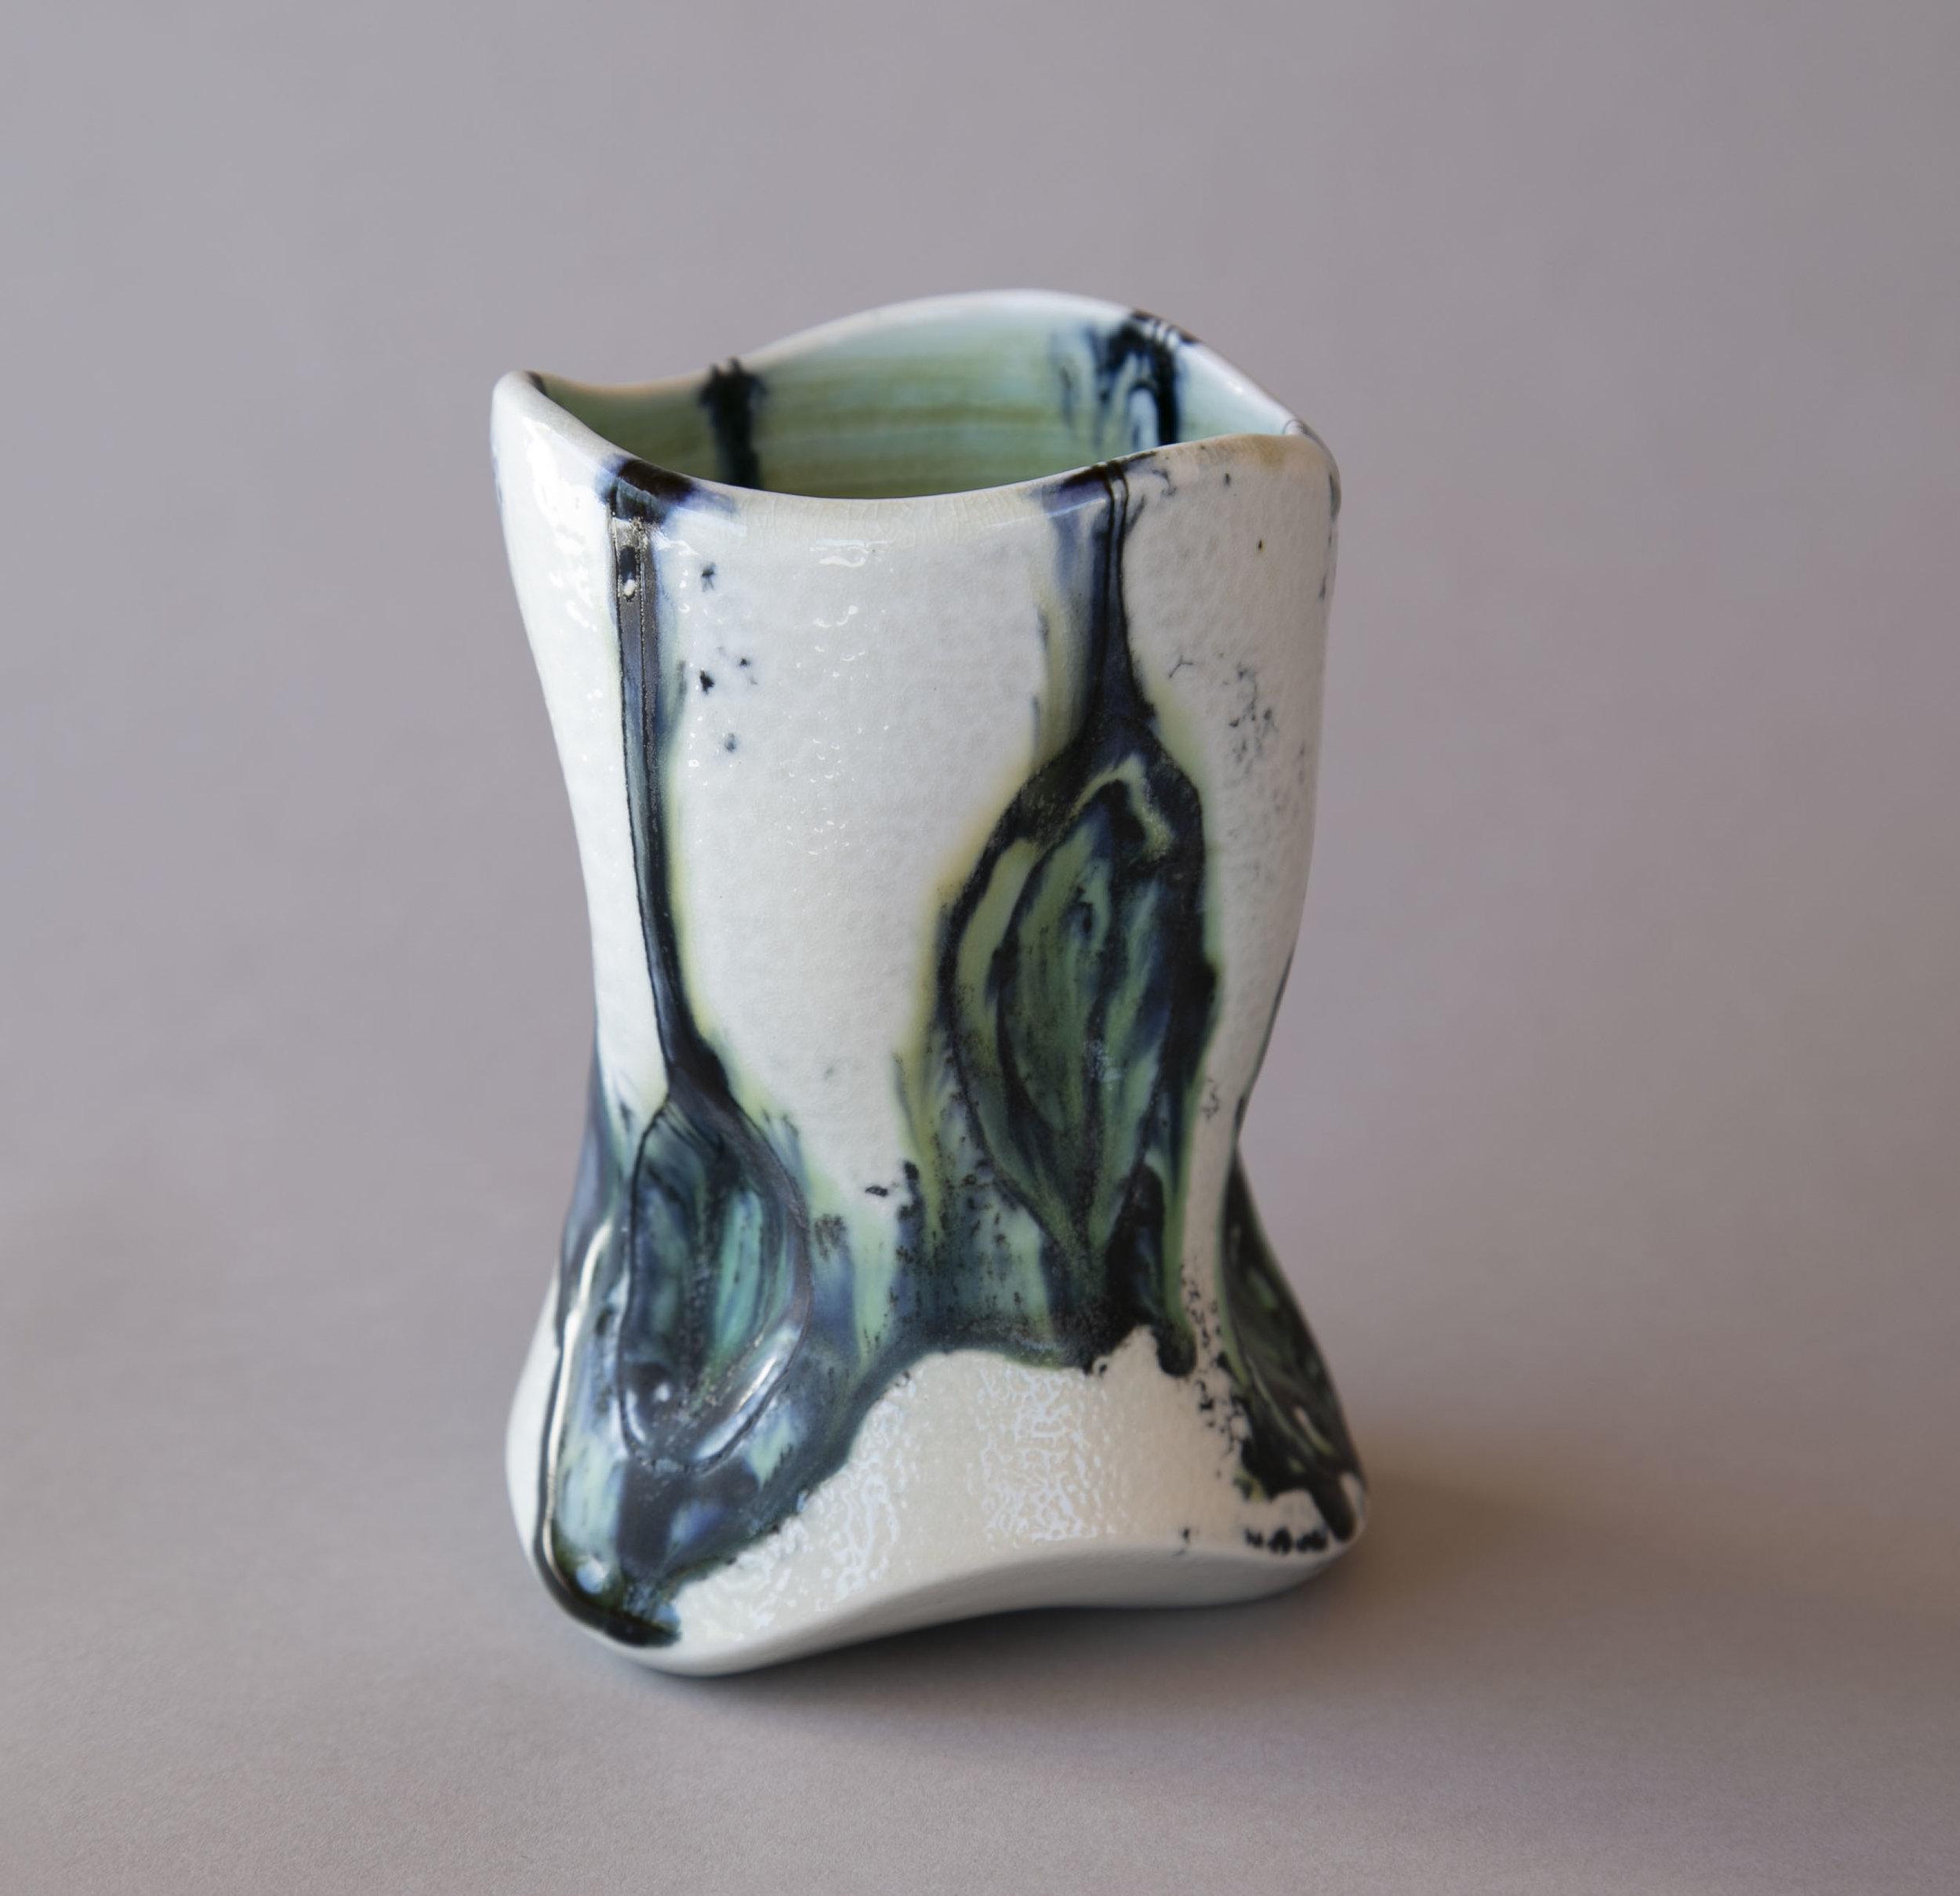 Bannerot, Julia, Tumbler, Cone 10 soda fired porcelain, $62, 719-213-8764.jpg